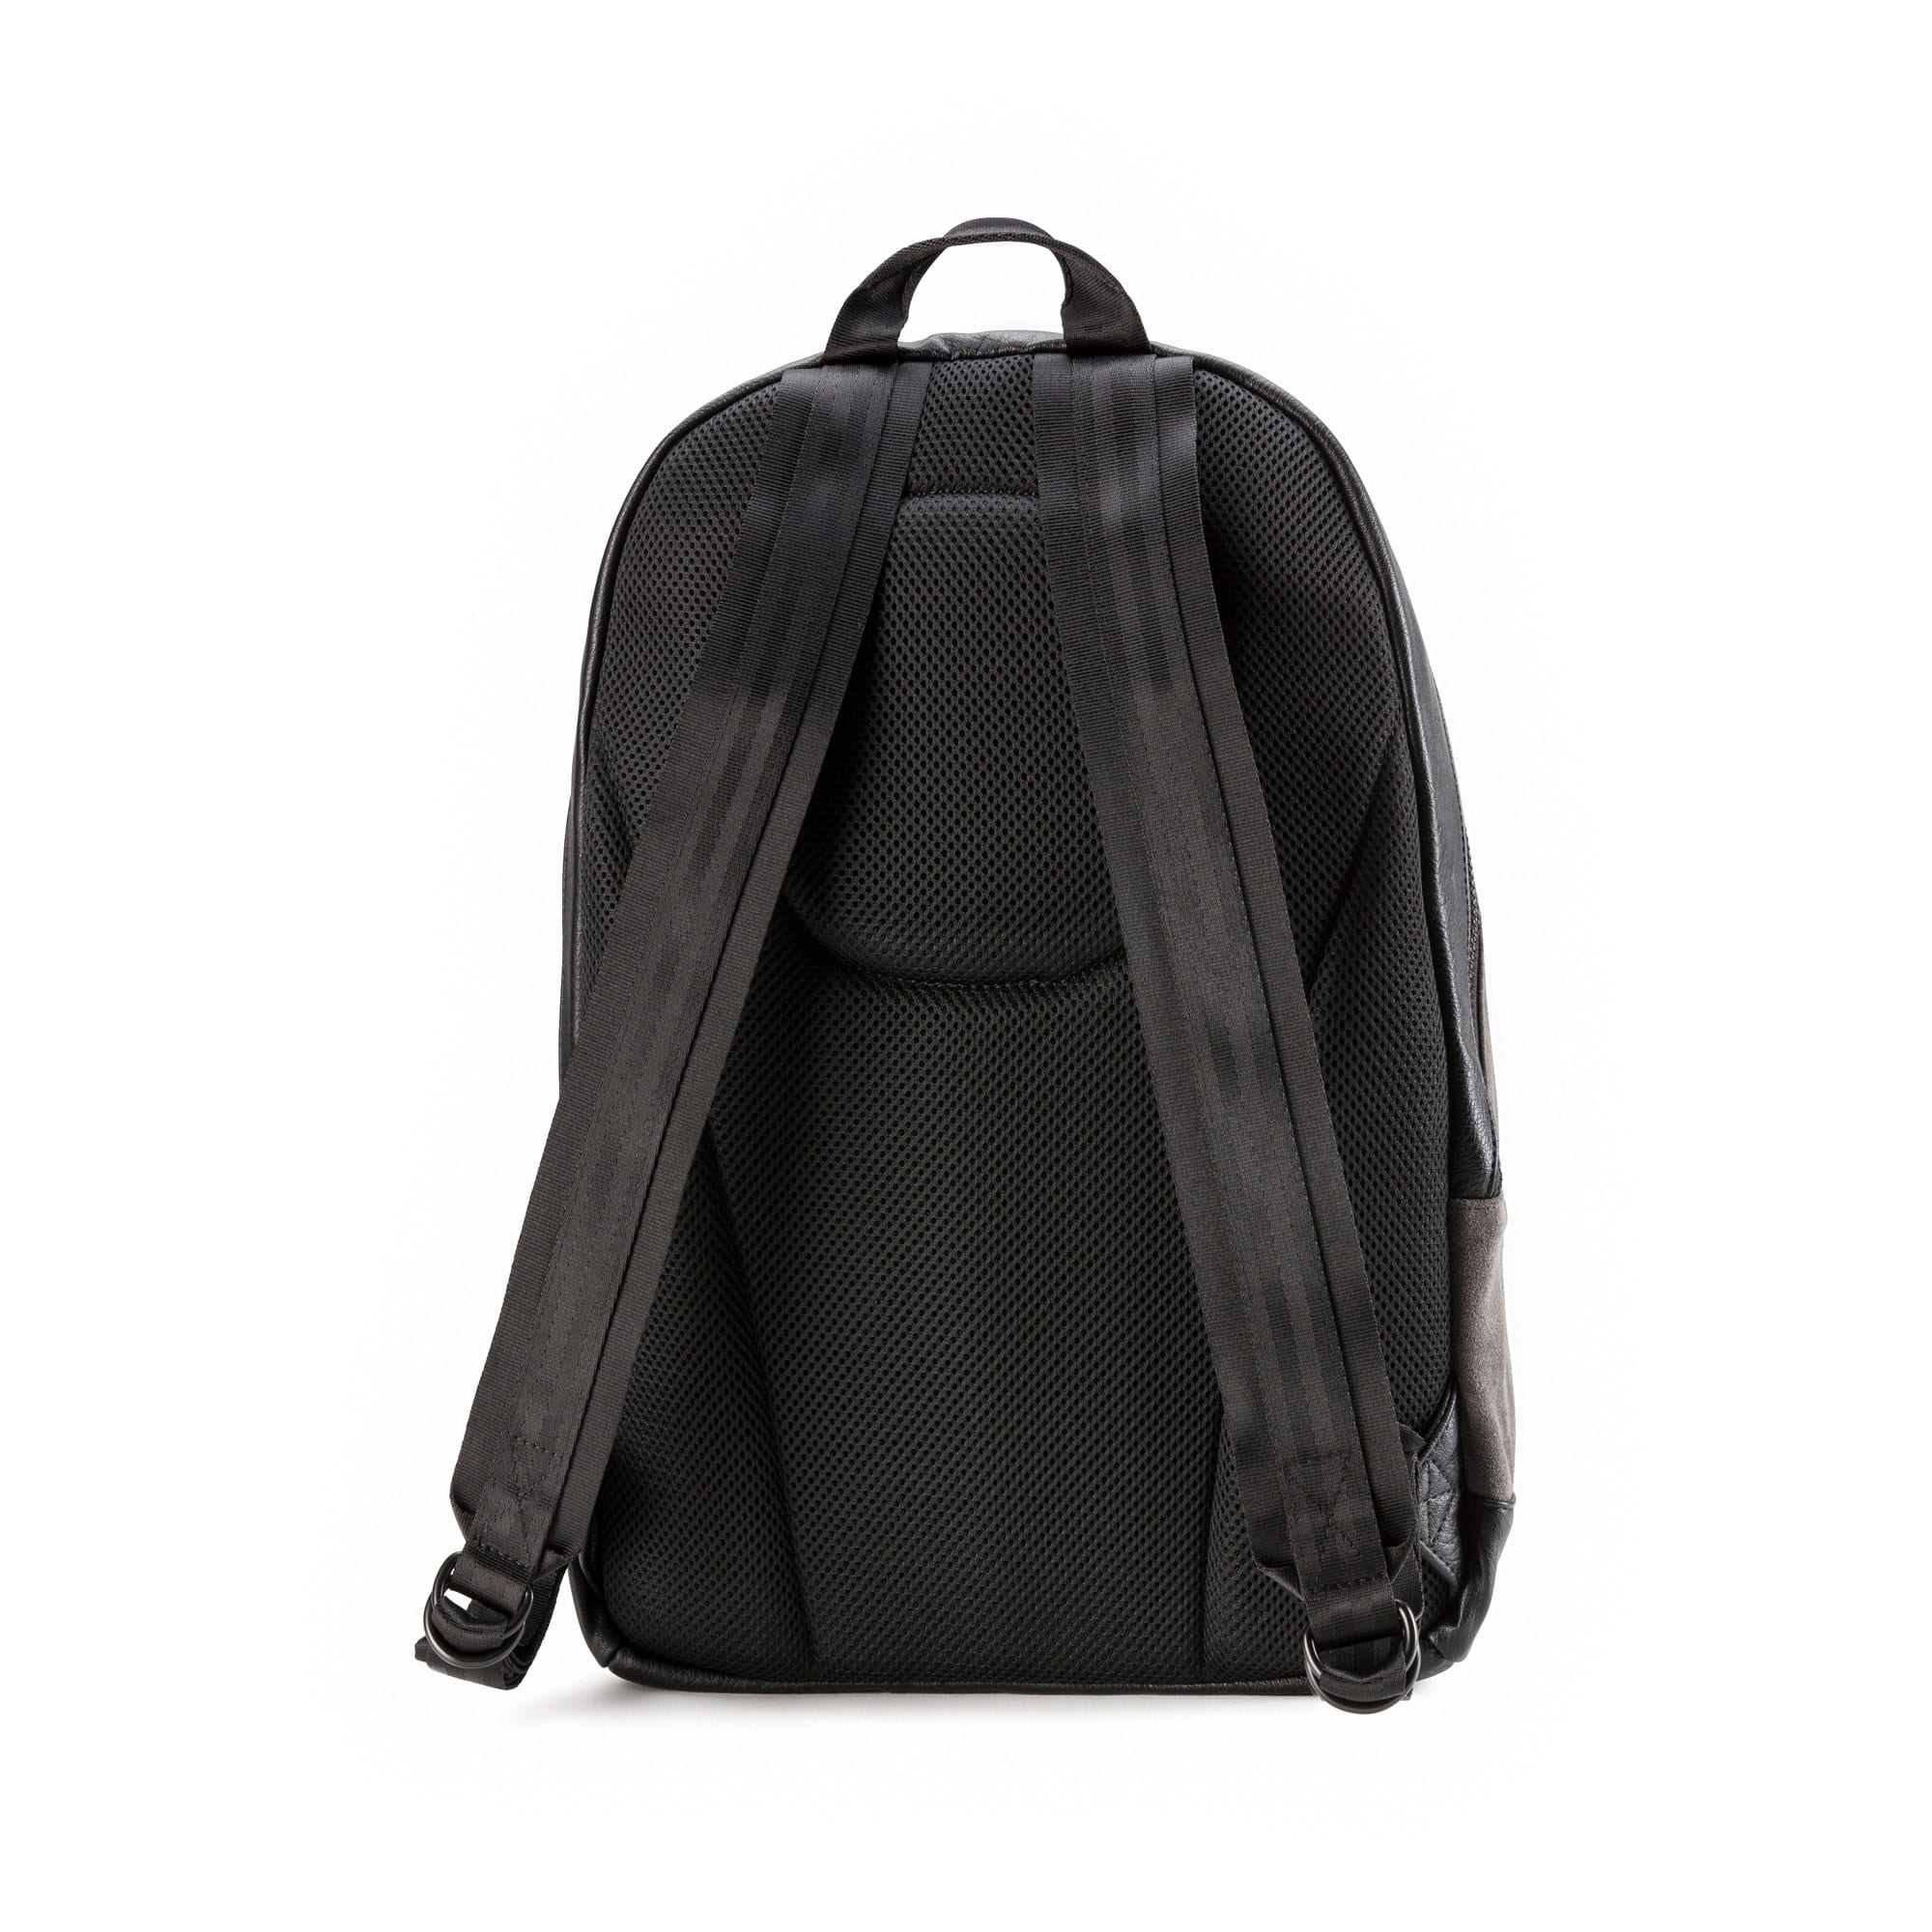 Thumbnail 2 of Suede Lux Backpack, Dark Shadow-Puma Black, medium